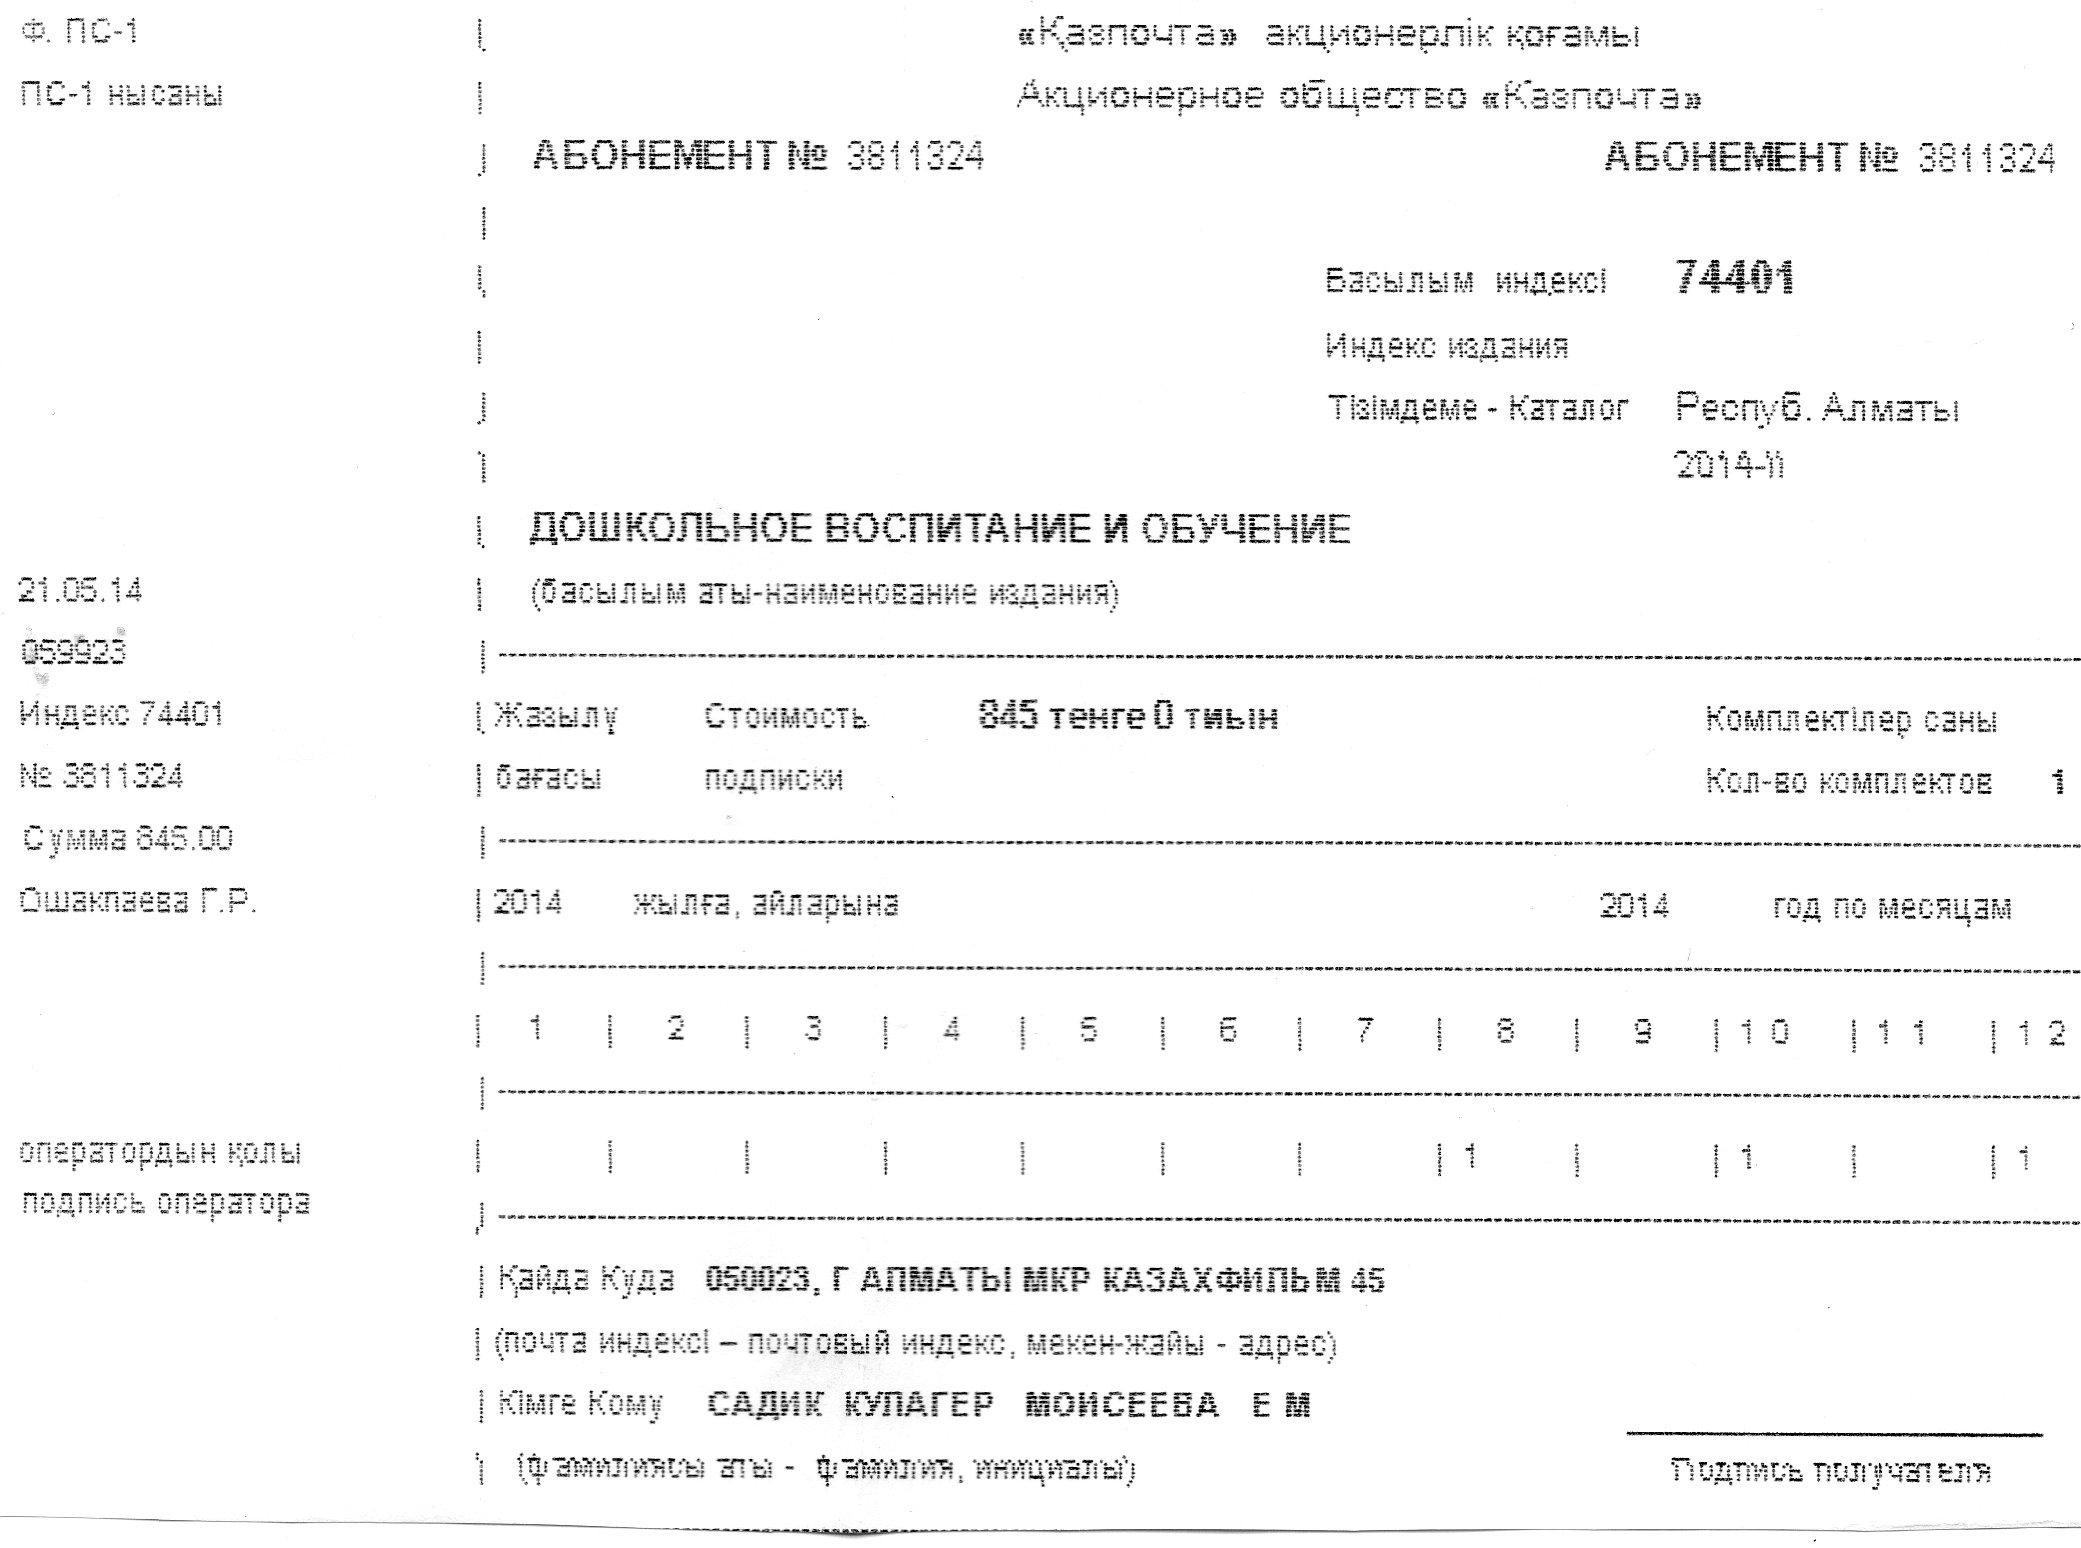 C:\Documents and Settings\Администратор\Рабочий стол\img063.jpg